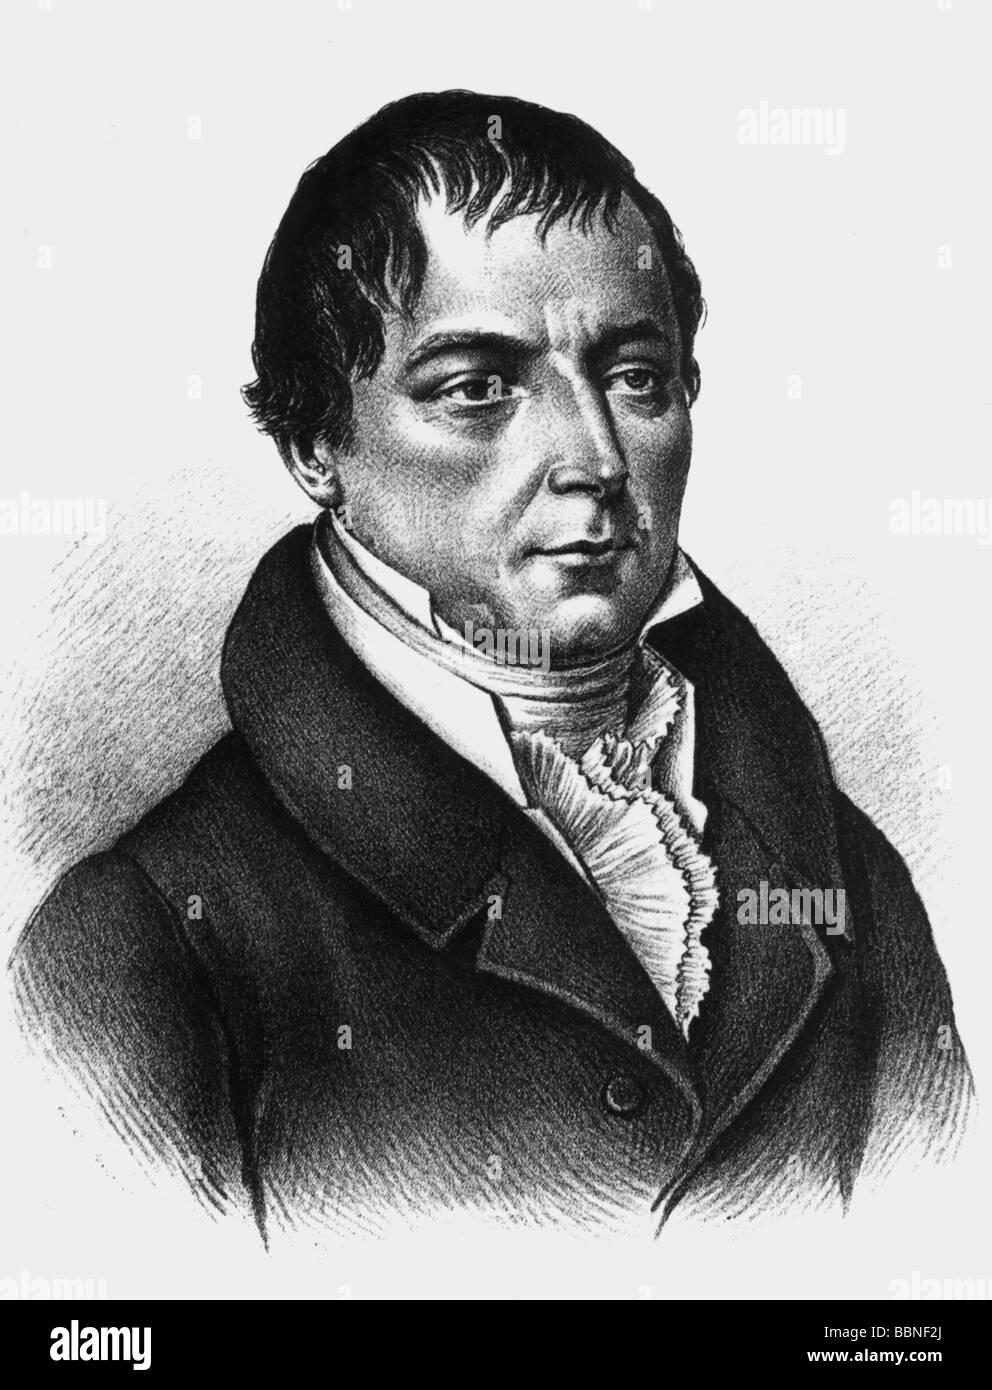 Buch, Christian Leopold von, 26. 4.1774 - 4.3.1853, German scientist (geologist), portrait, contemporary engraving, , Stock Photo